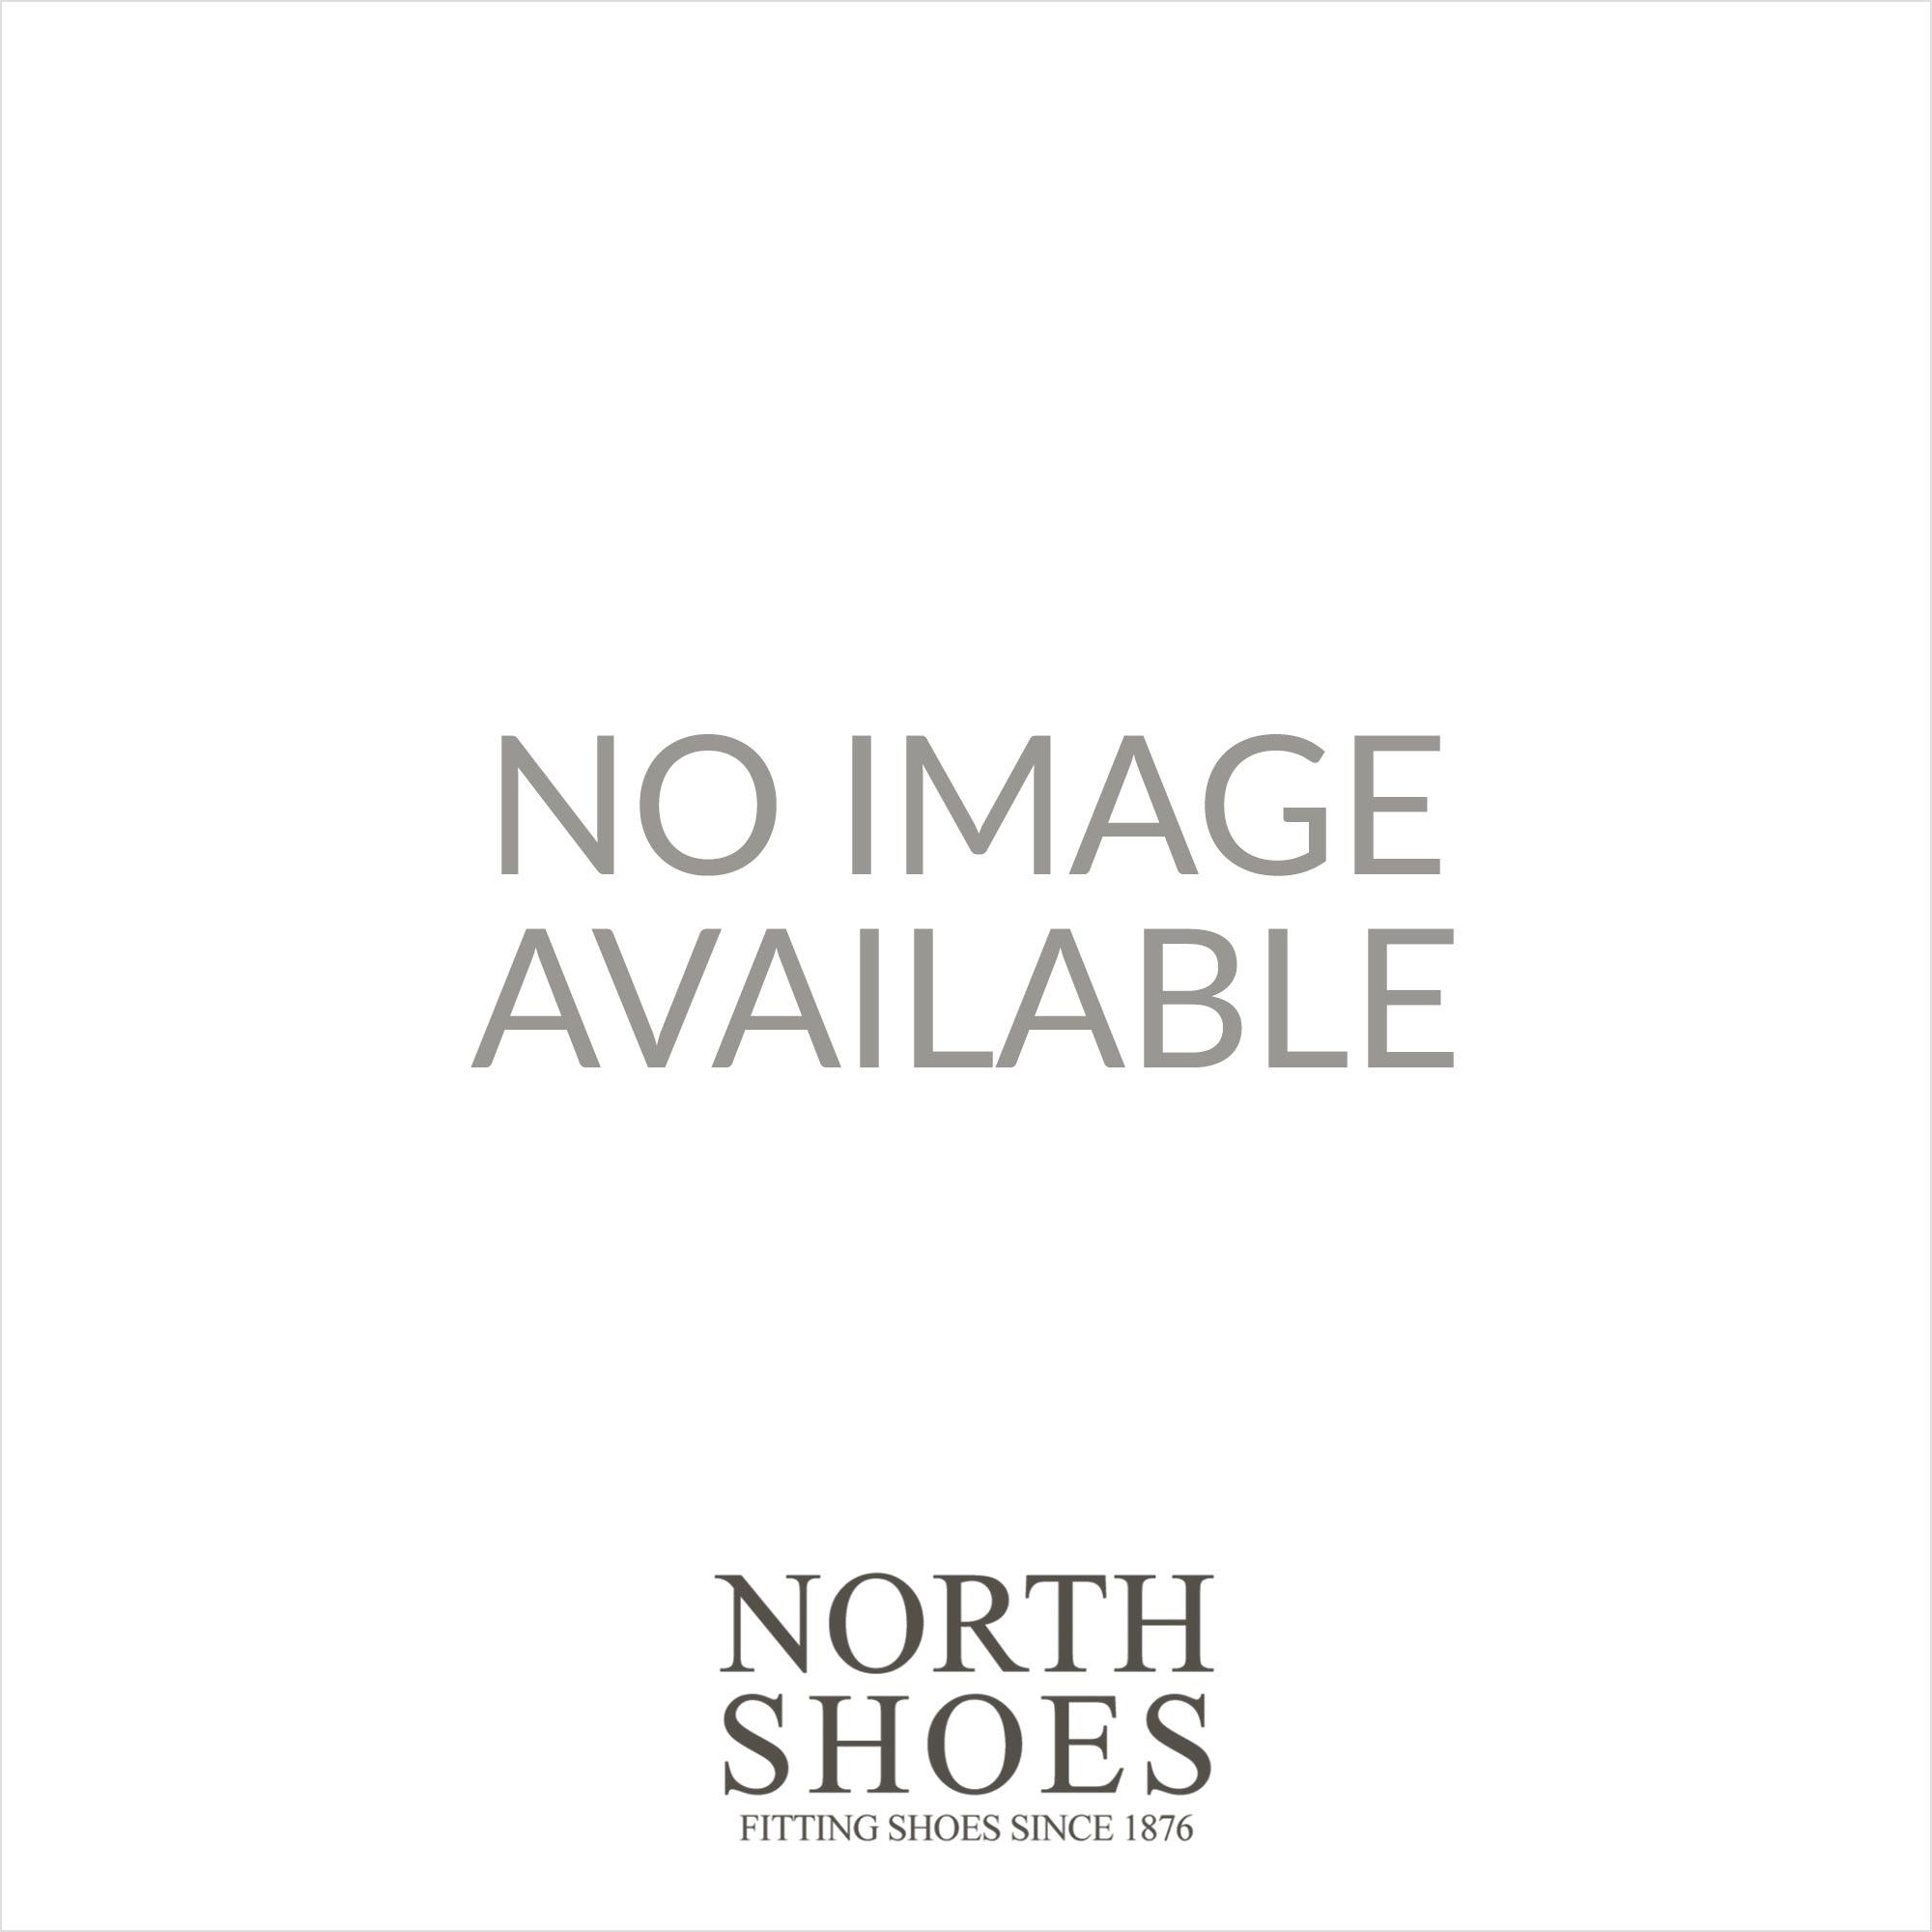 2c5cc7527495 Skechers On the GO 600 - Glossy 16150 Black Mesh Womens Toe Post ...